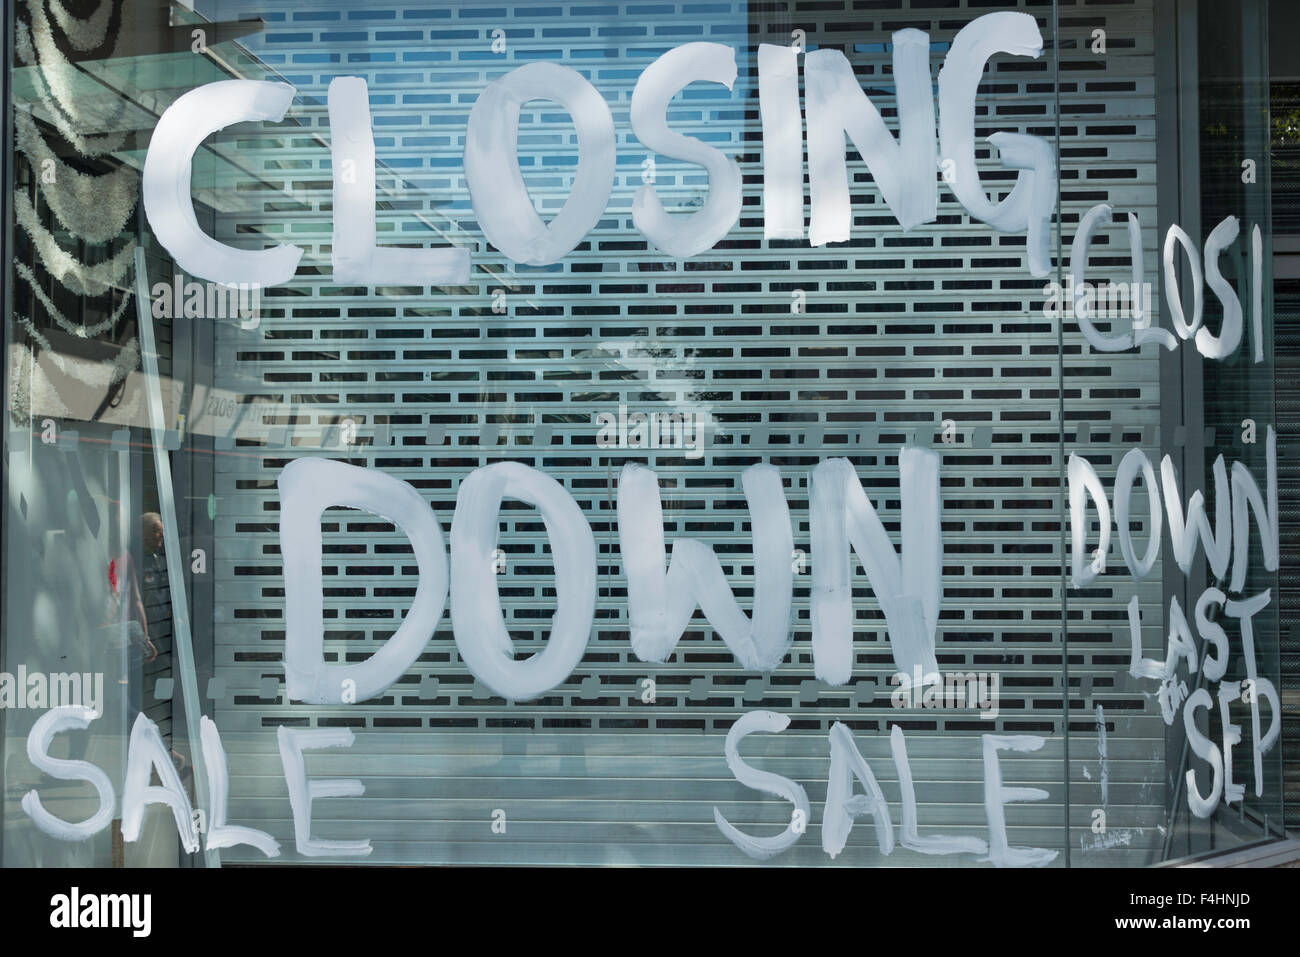 Closing down sign on shop window, Canal Walk, Swindon, Wiltshire, England, United Kingdom - Stock Image